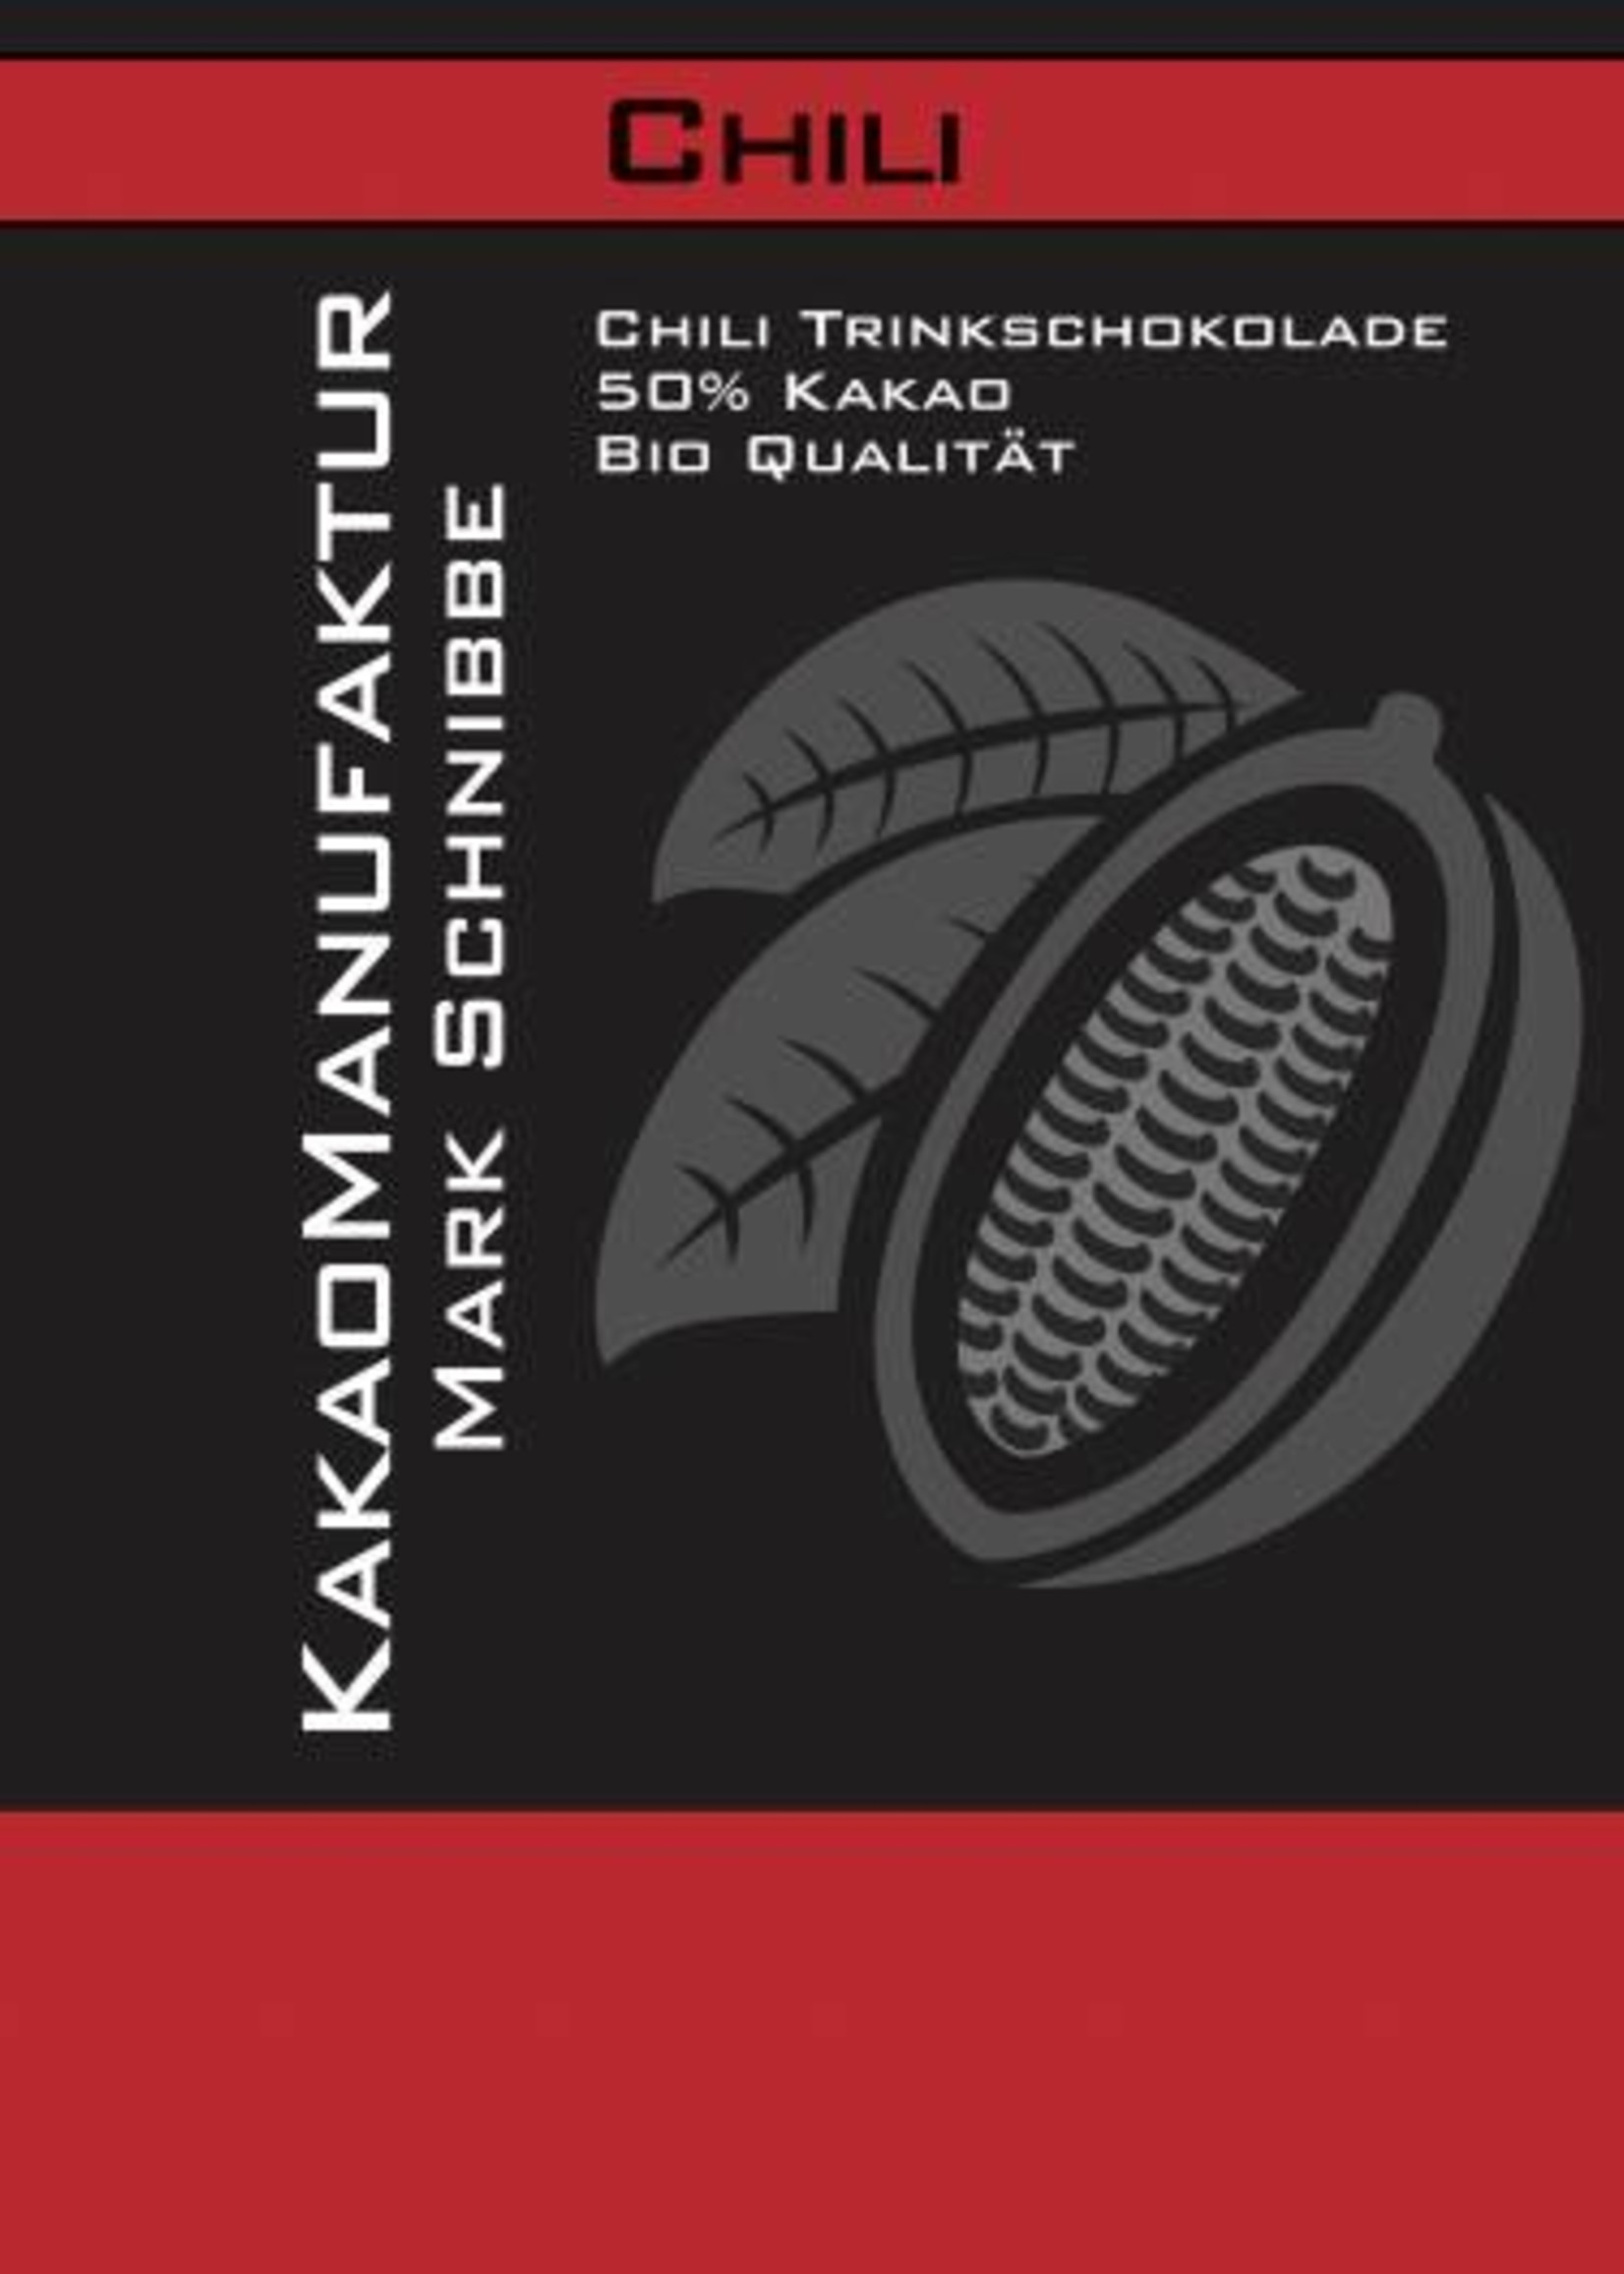 Bio Vegan Chili-Kakao 50%